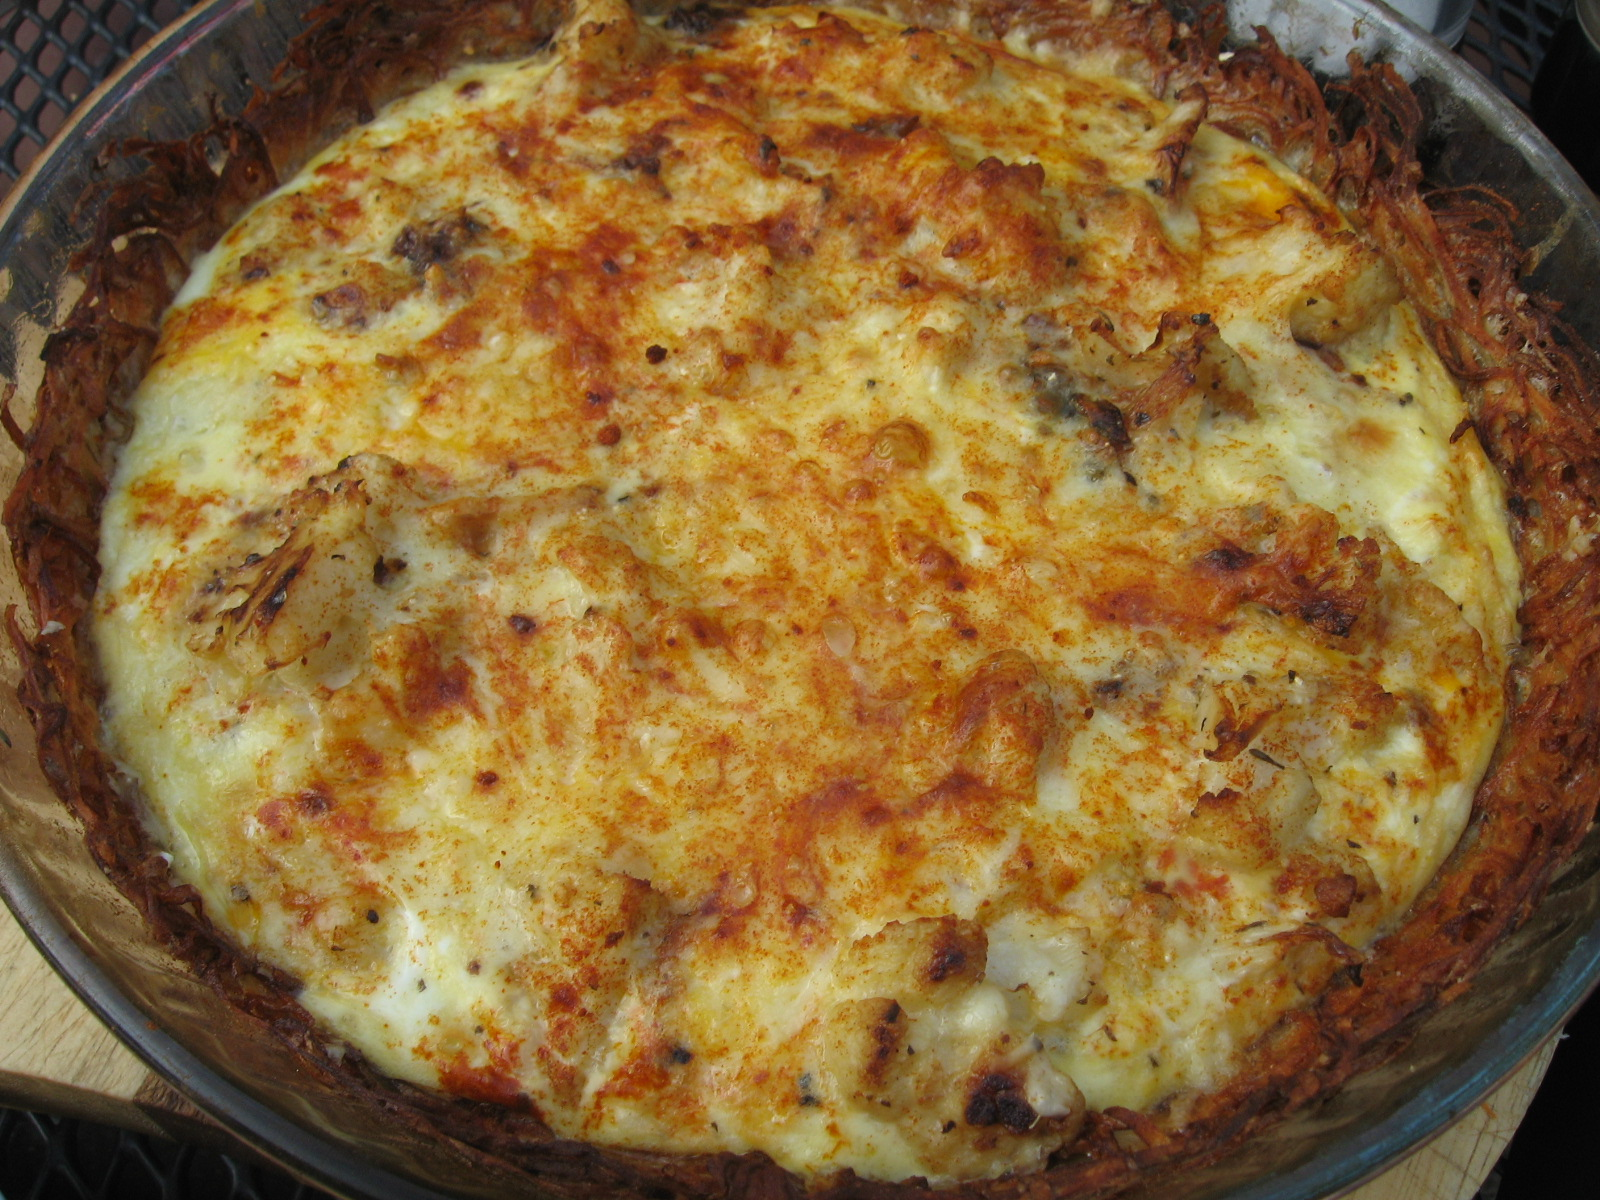 ... family) blog: Dinner, 8/5/16: Cauliflower Cheese Pie (Moosewood